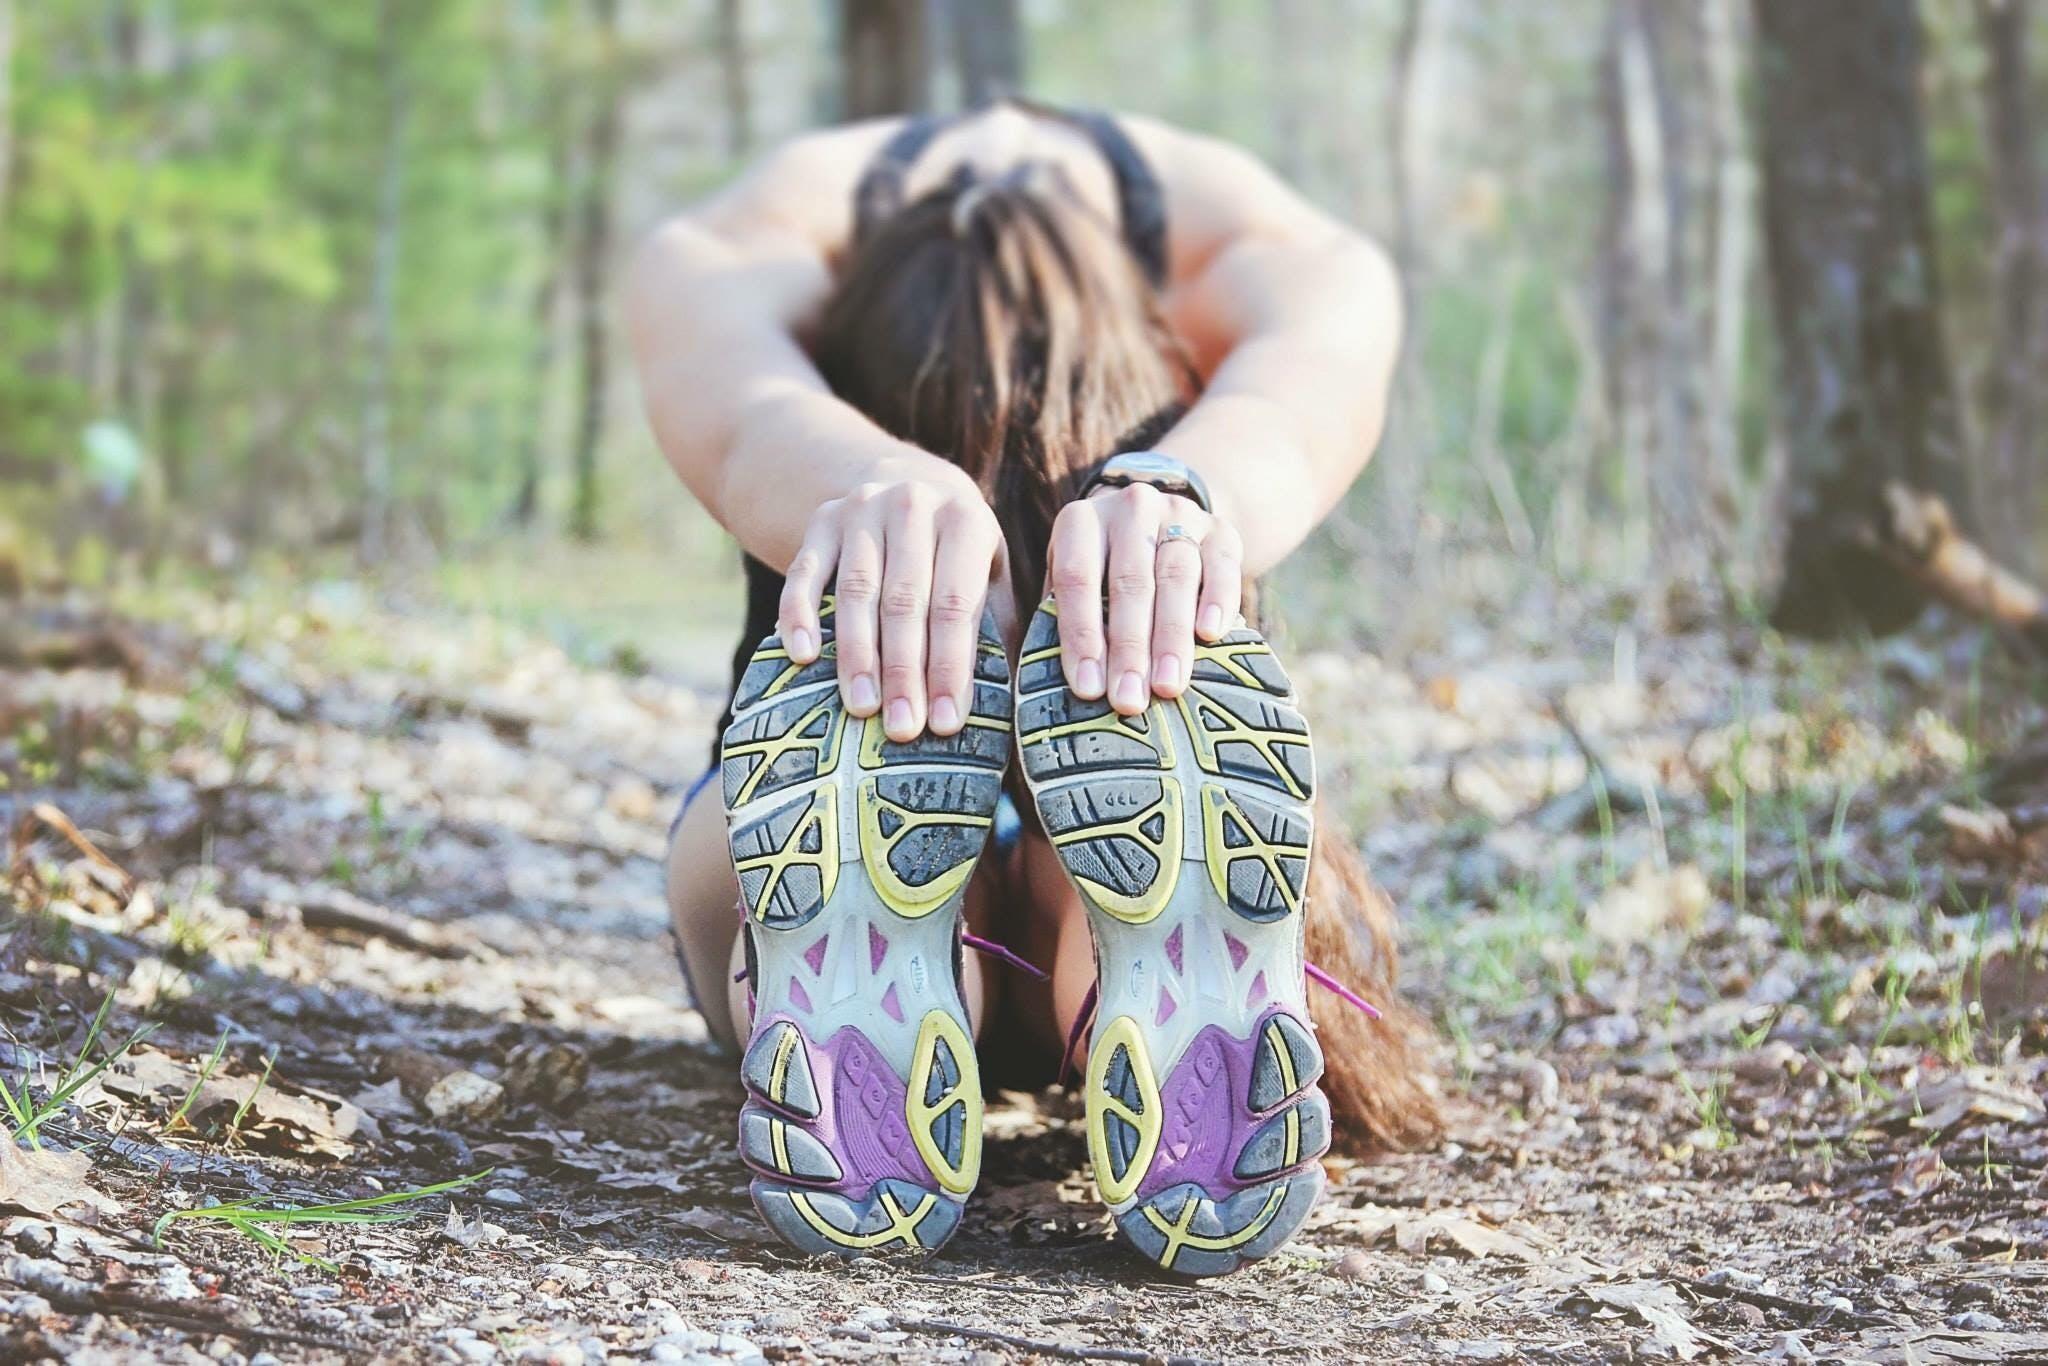 la fitness goals trail marathon